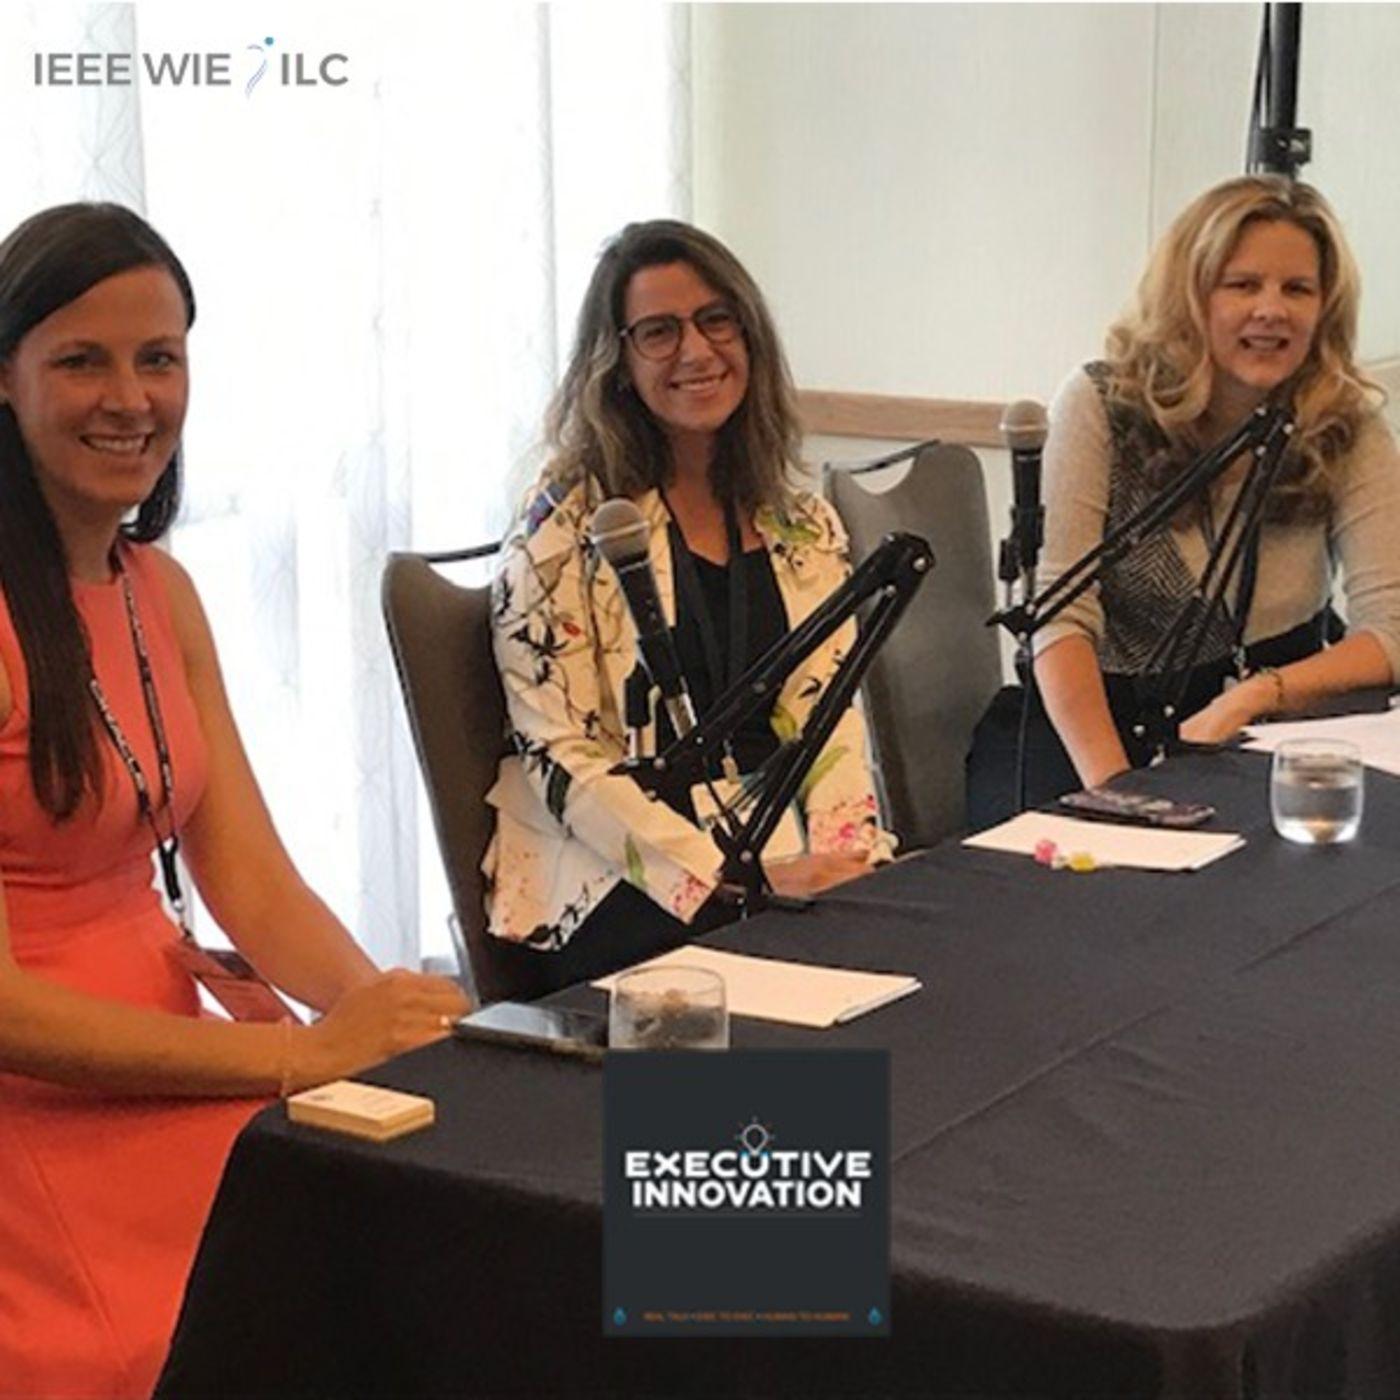 Live at IEEE: Female Entrepreneurship Roundtable